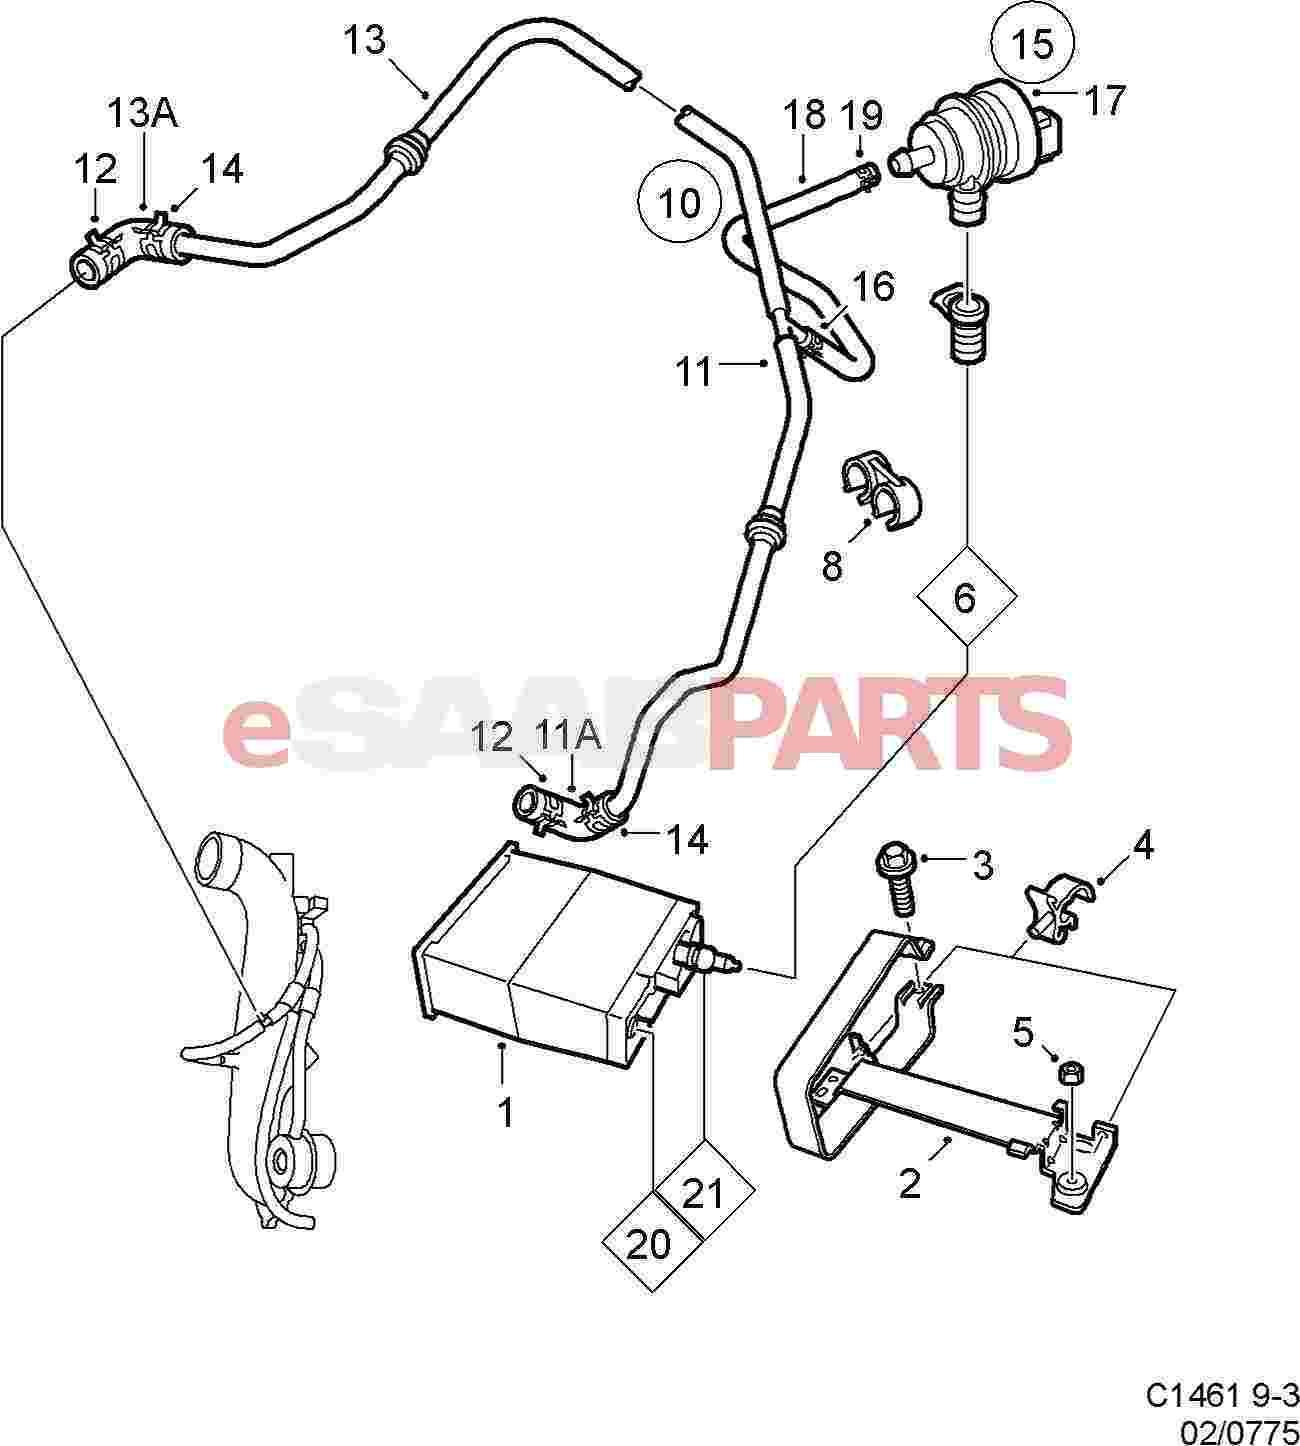 Subaru Impreza Transmission Dipstick Location